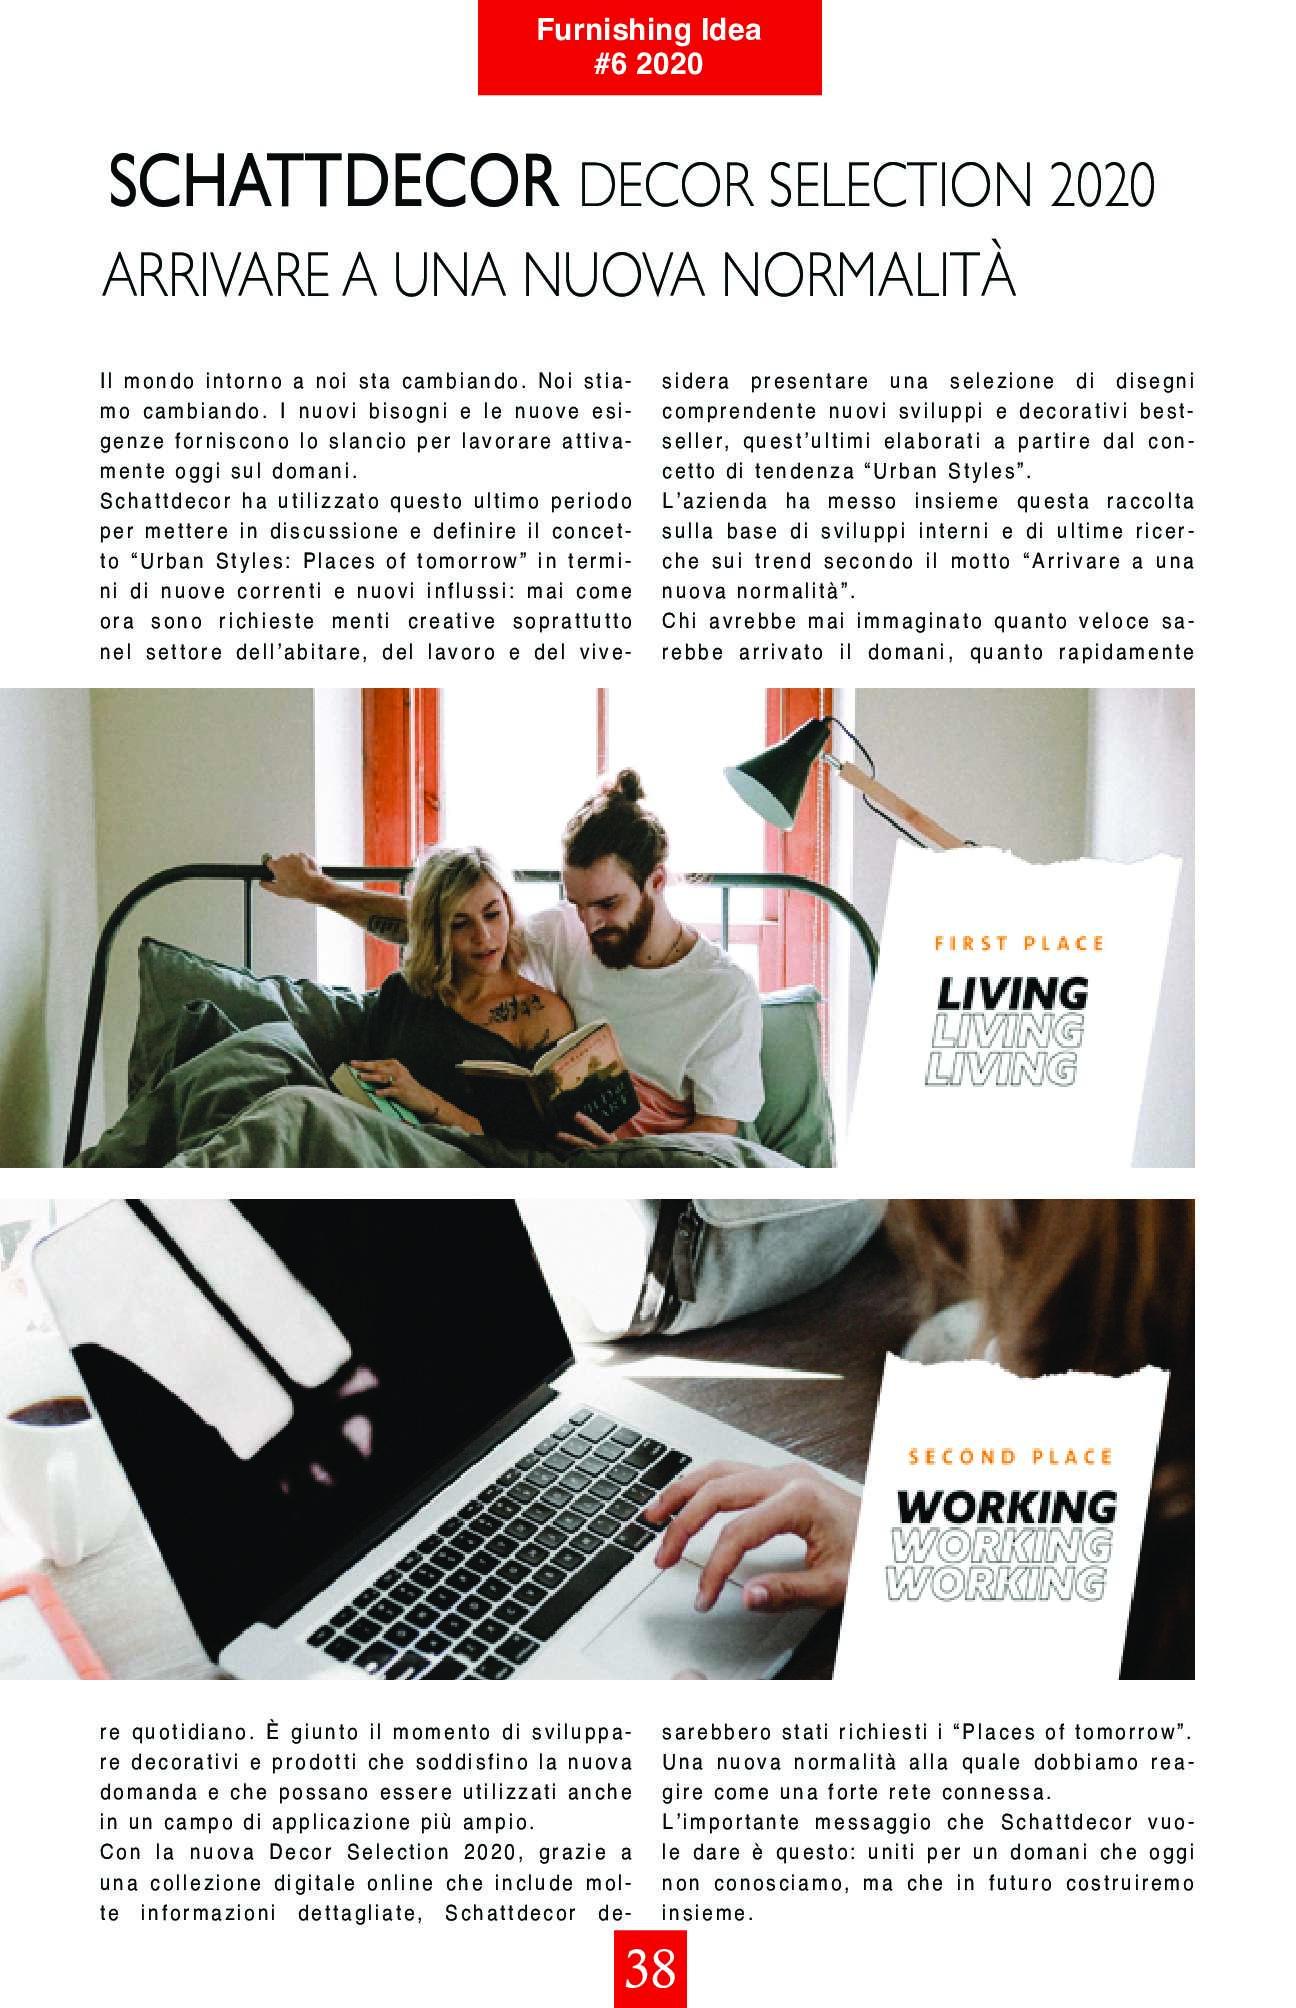 furnishingidea-6-2020_journal_22_037.jpg